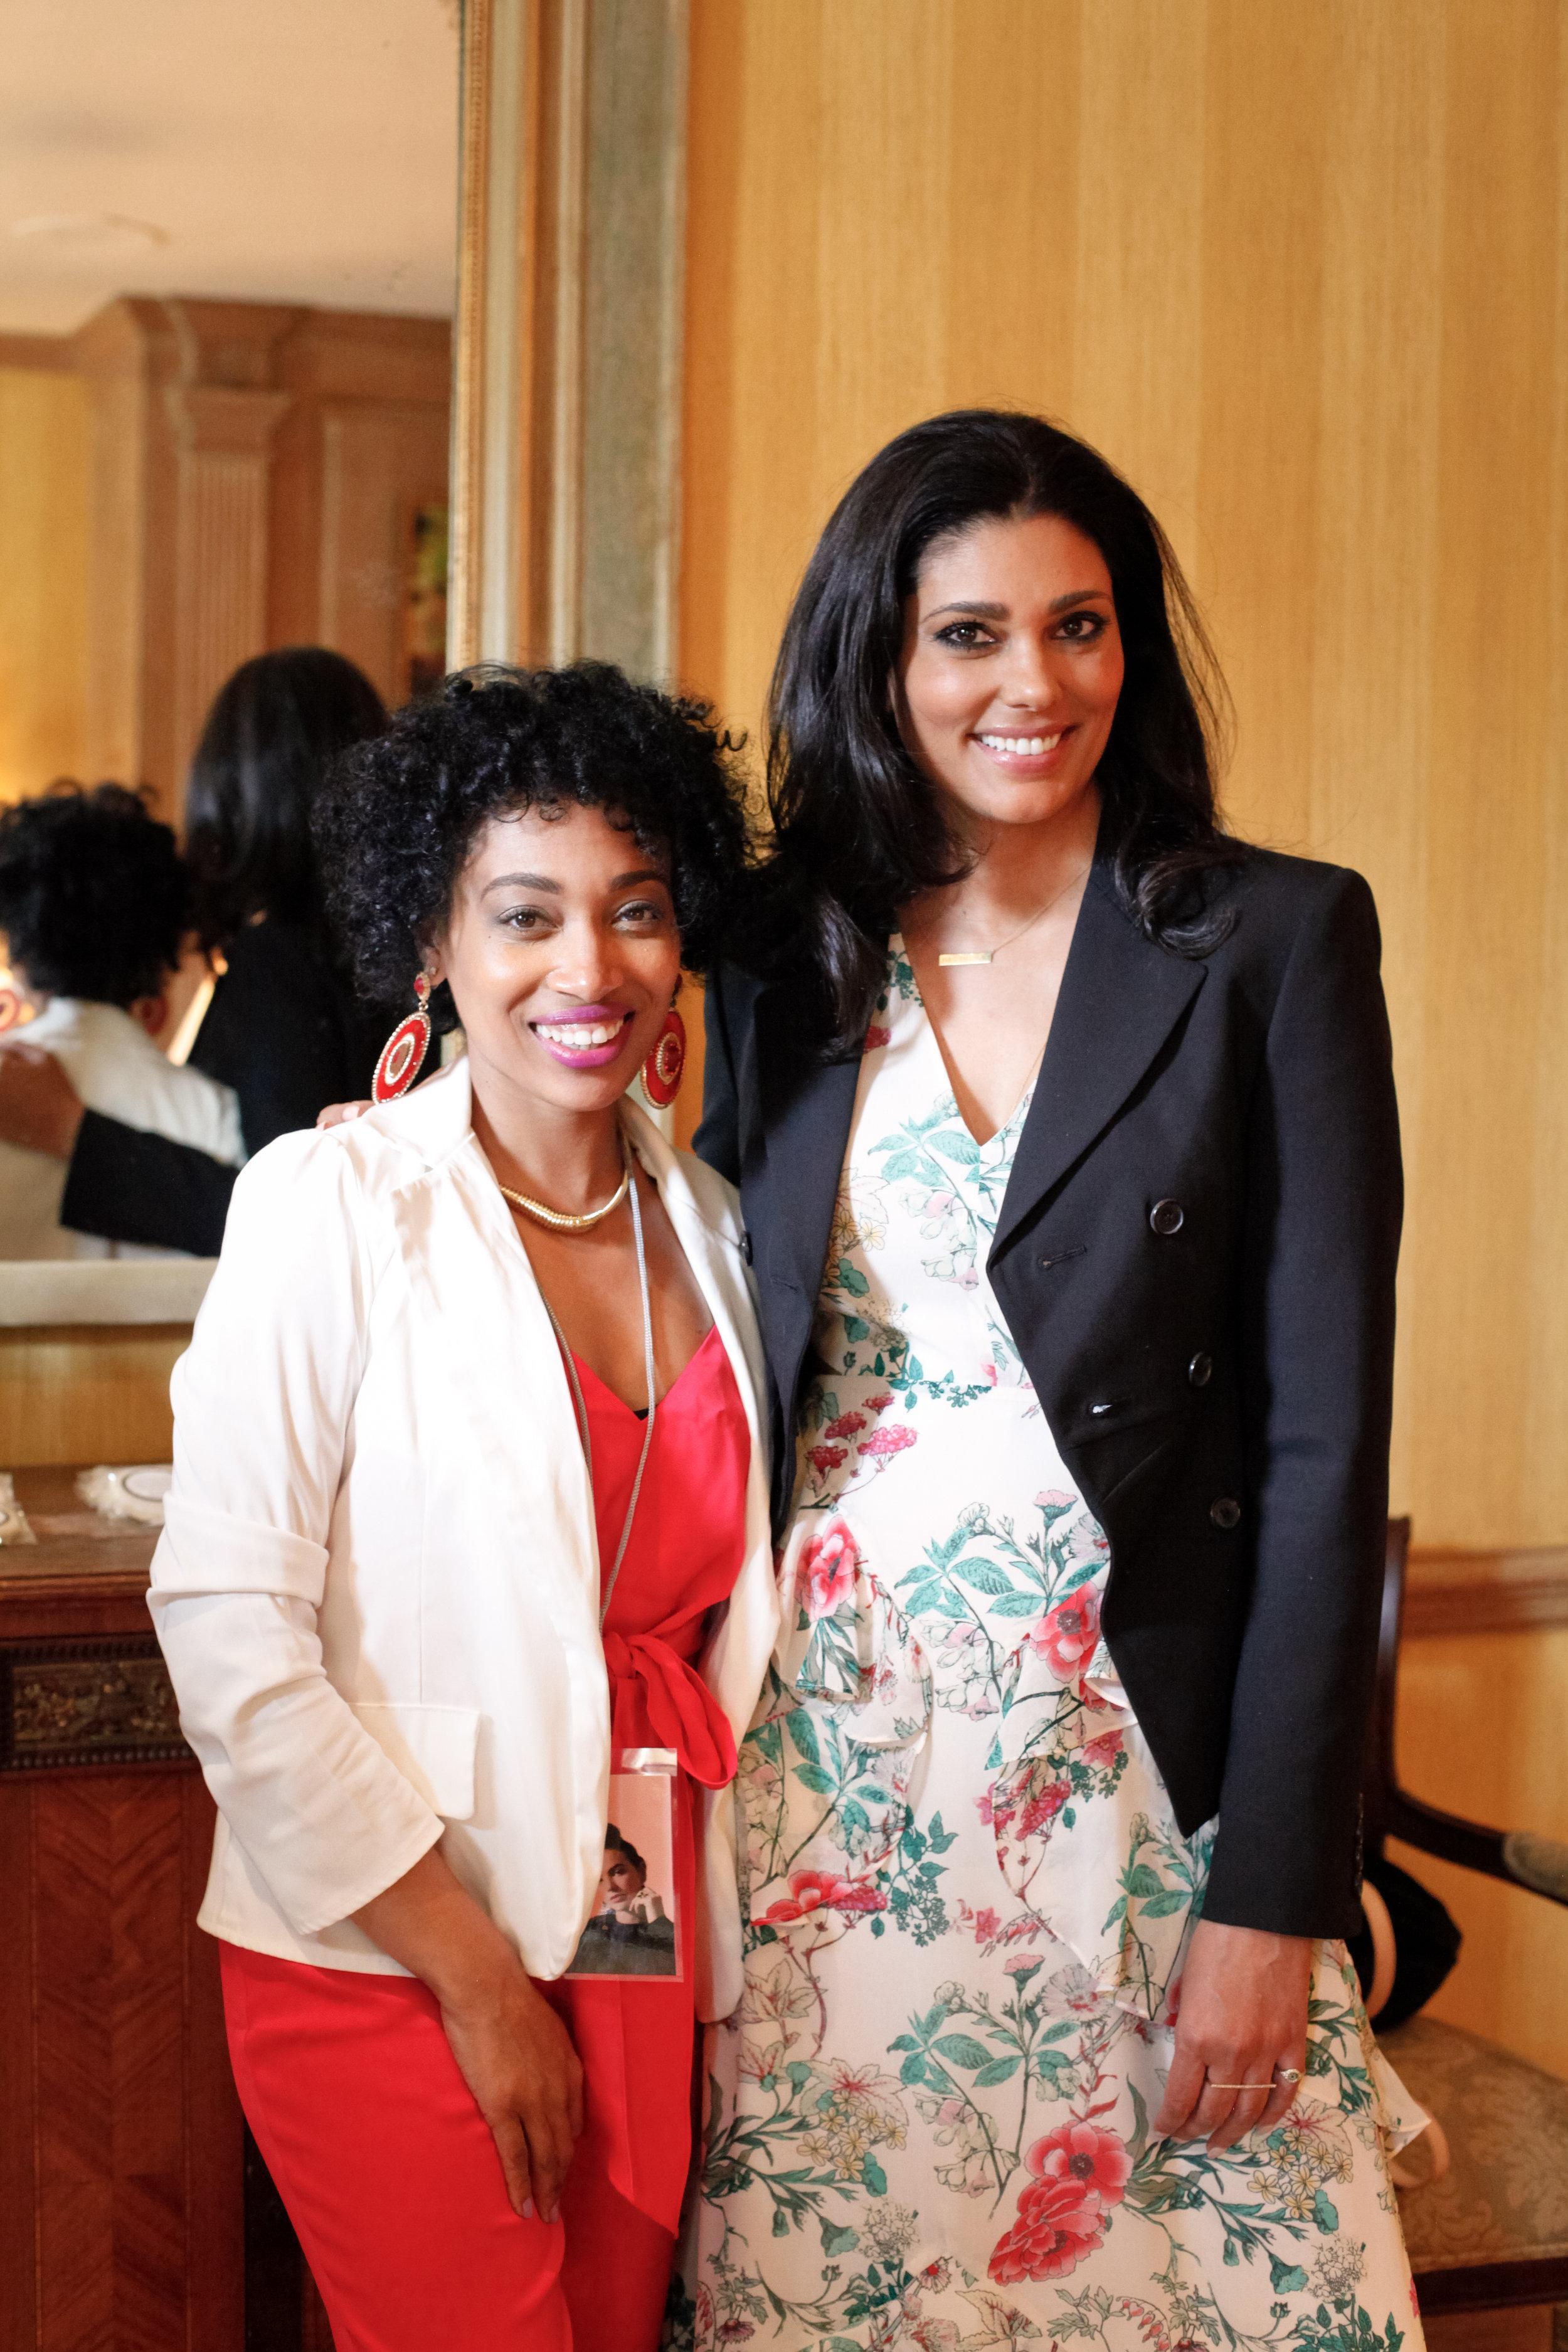 Andrea Fenise Memphis Fashion Blogger shares #memphisfashionweek headlining luncheon with Rachel Roy